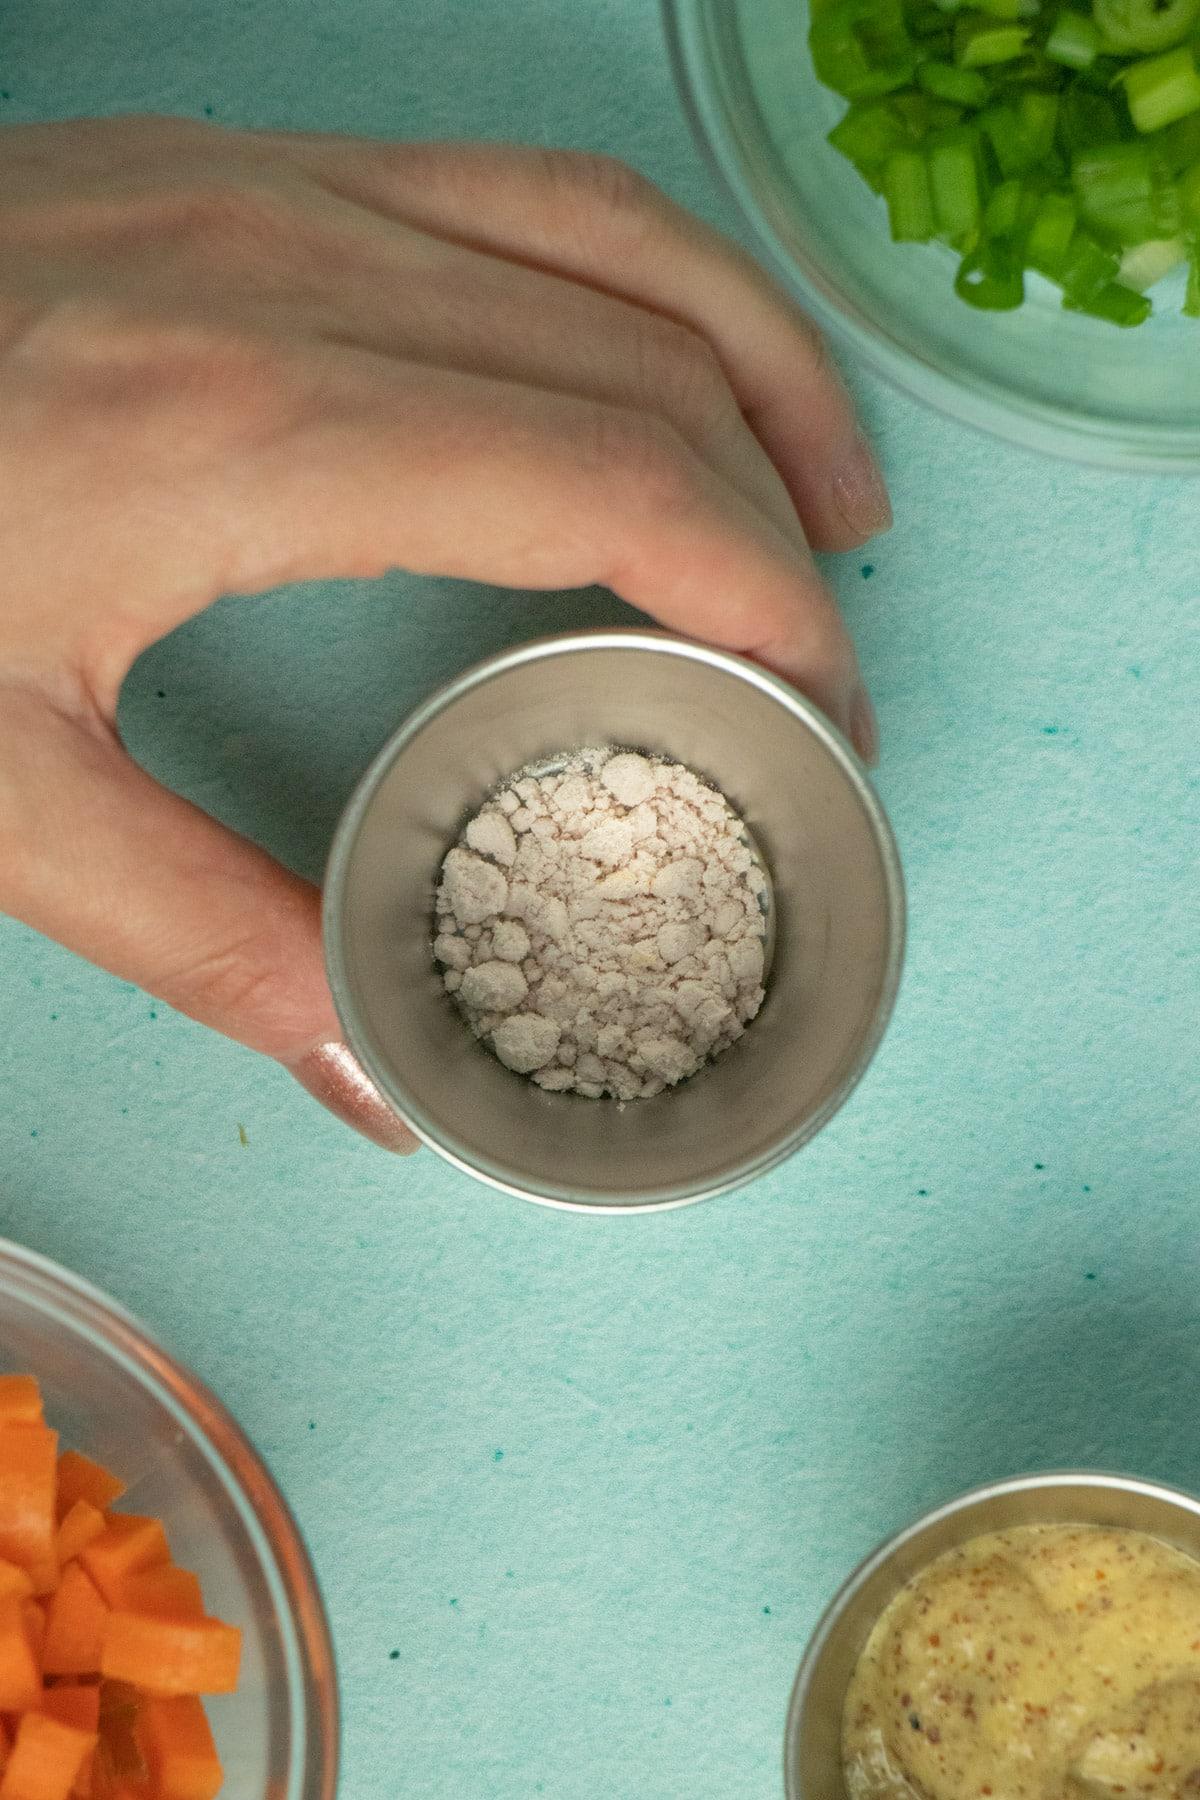 hand picking up a ramekin of black salt from a table